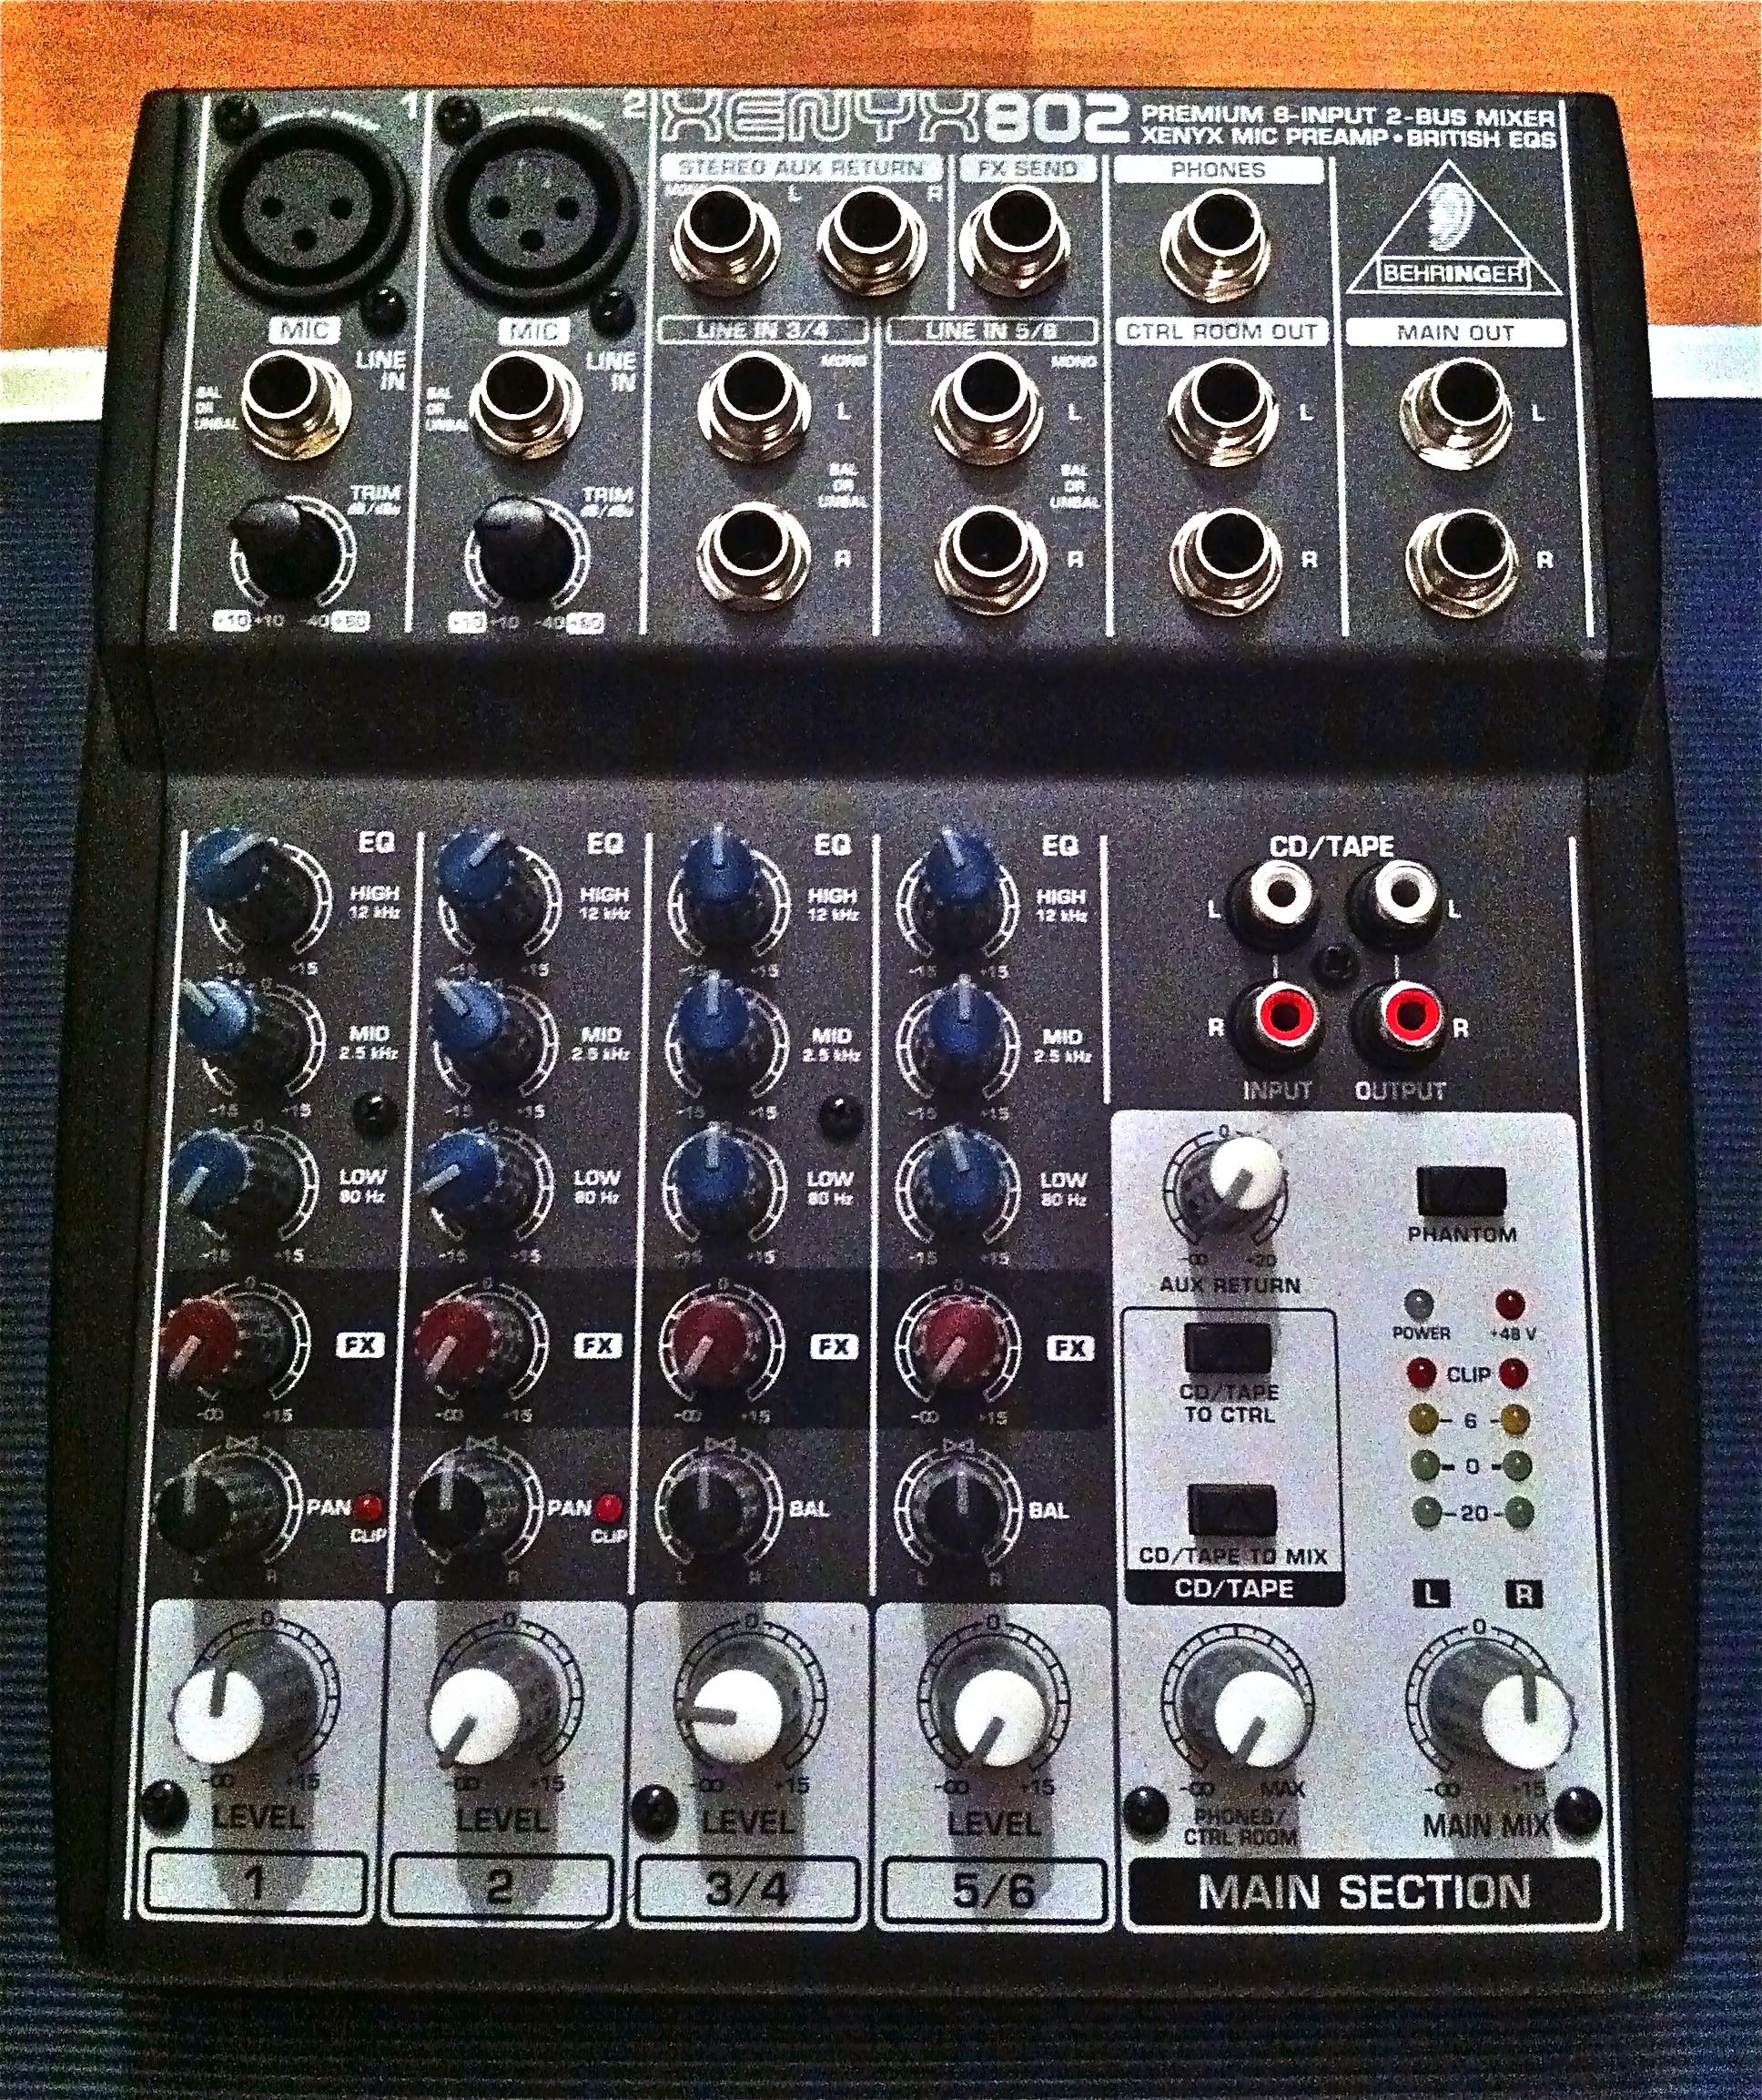 Behringer Mixer 802 : behringer xenyx 802 image 490538 audiofanzine ~ Vivirlamusica.com Haus und Dekorationen